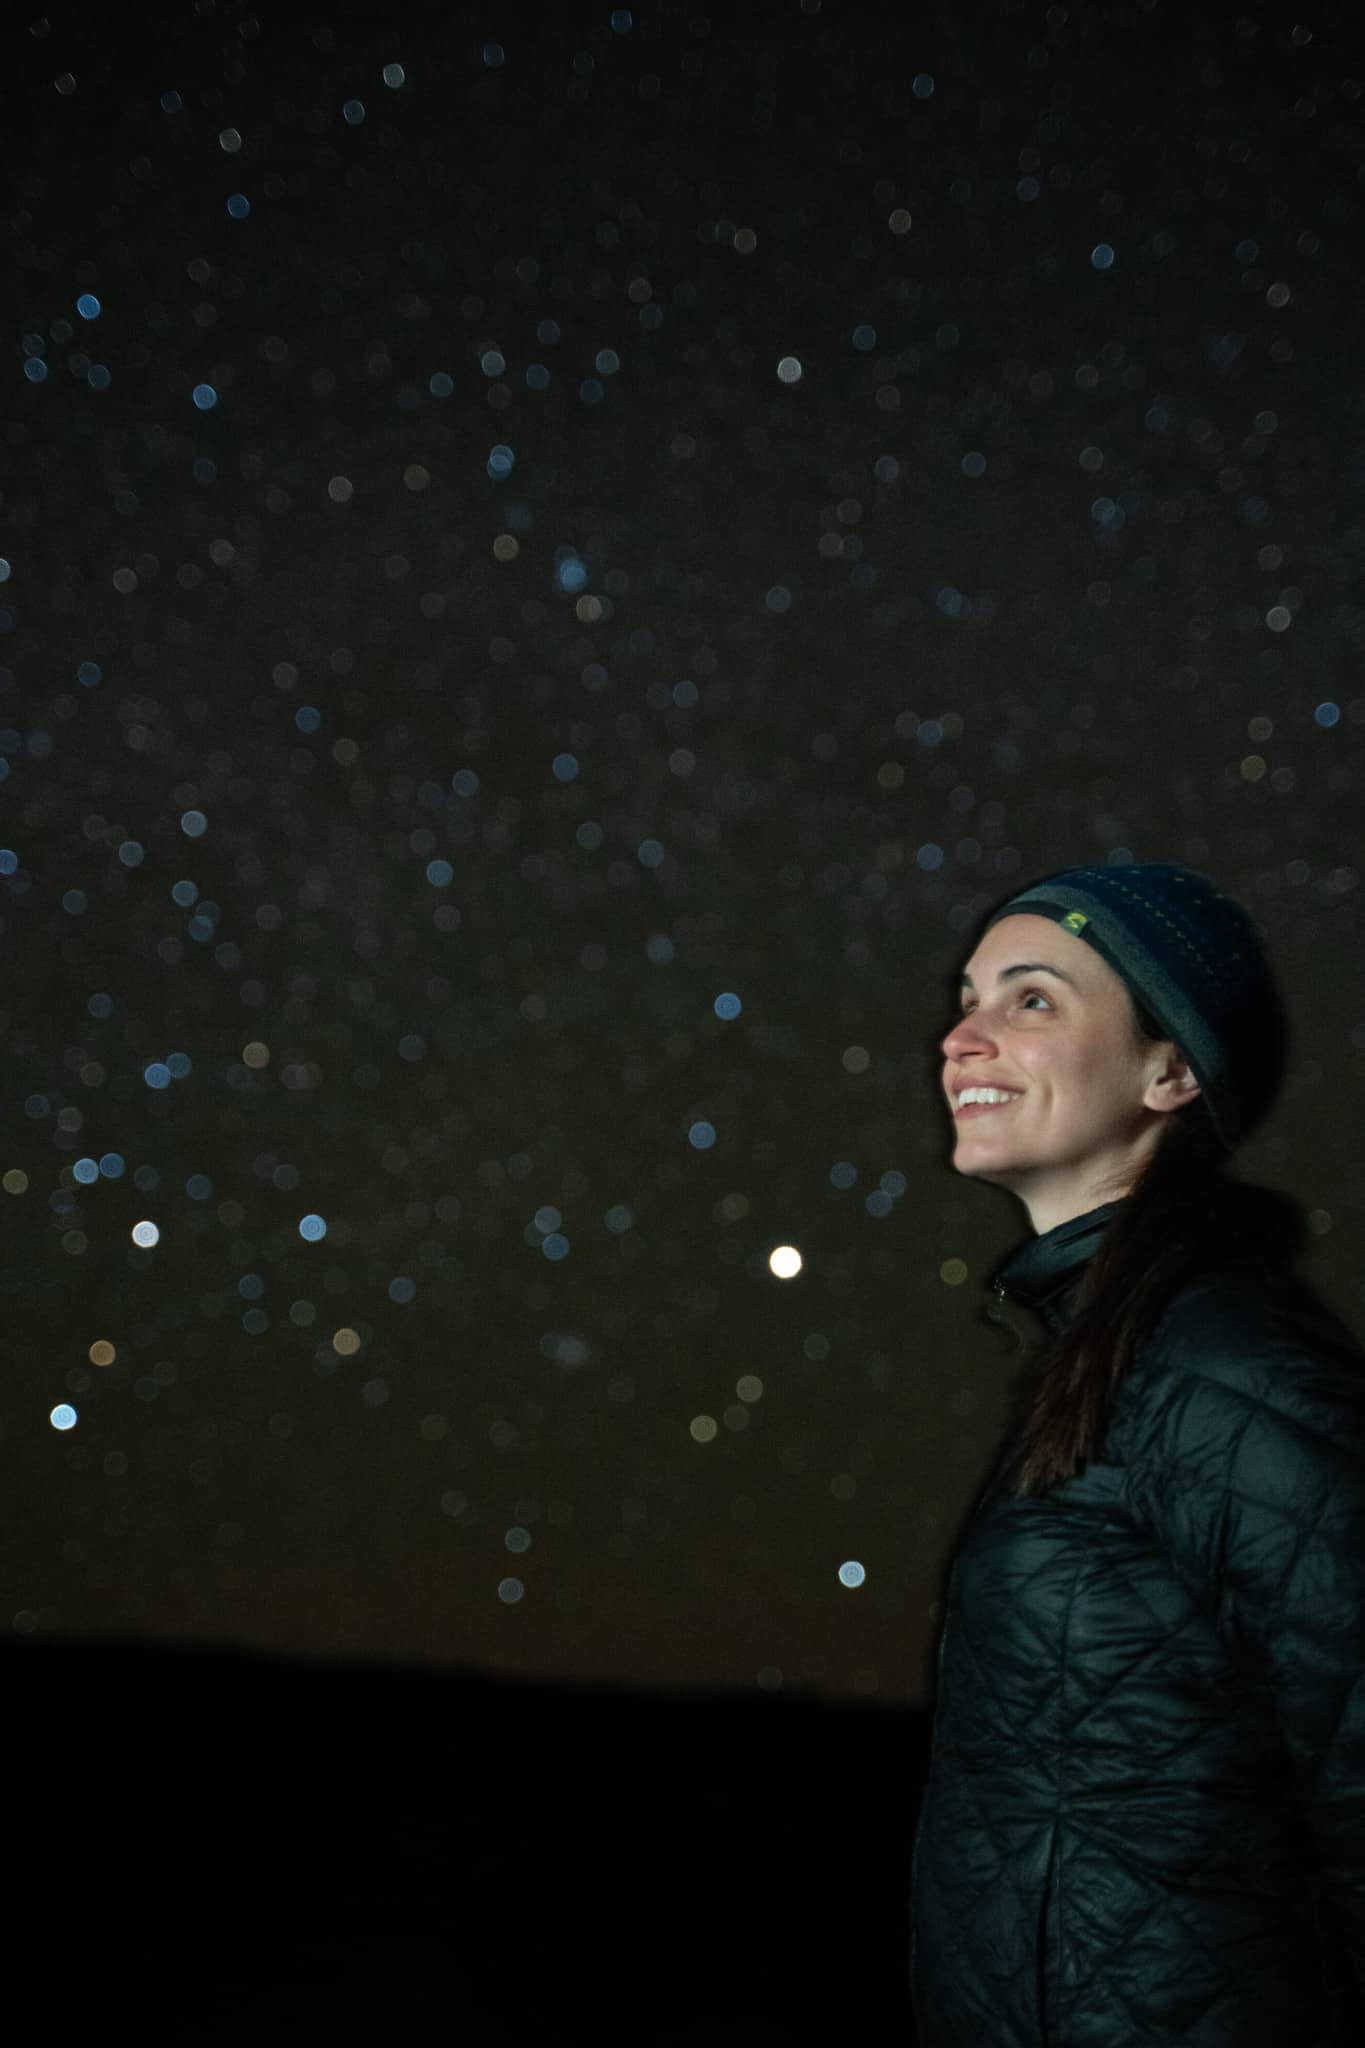 Stargazing in Hawaii - Valerie Stargazing